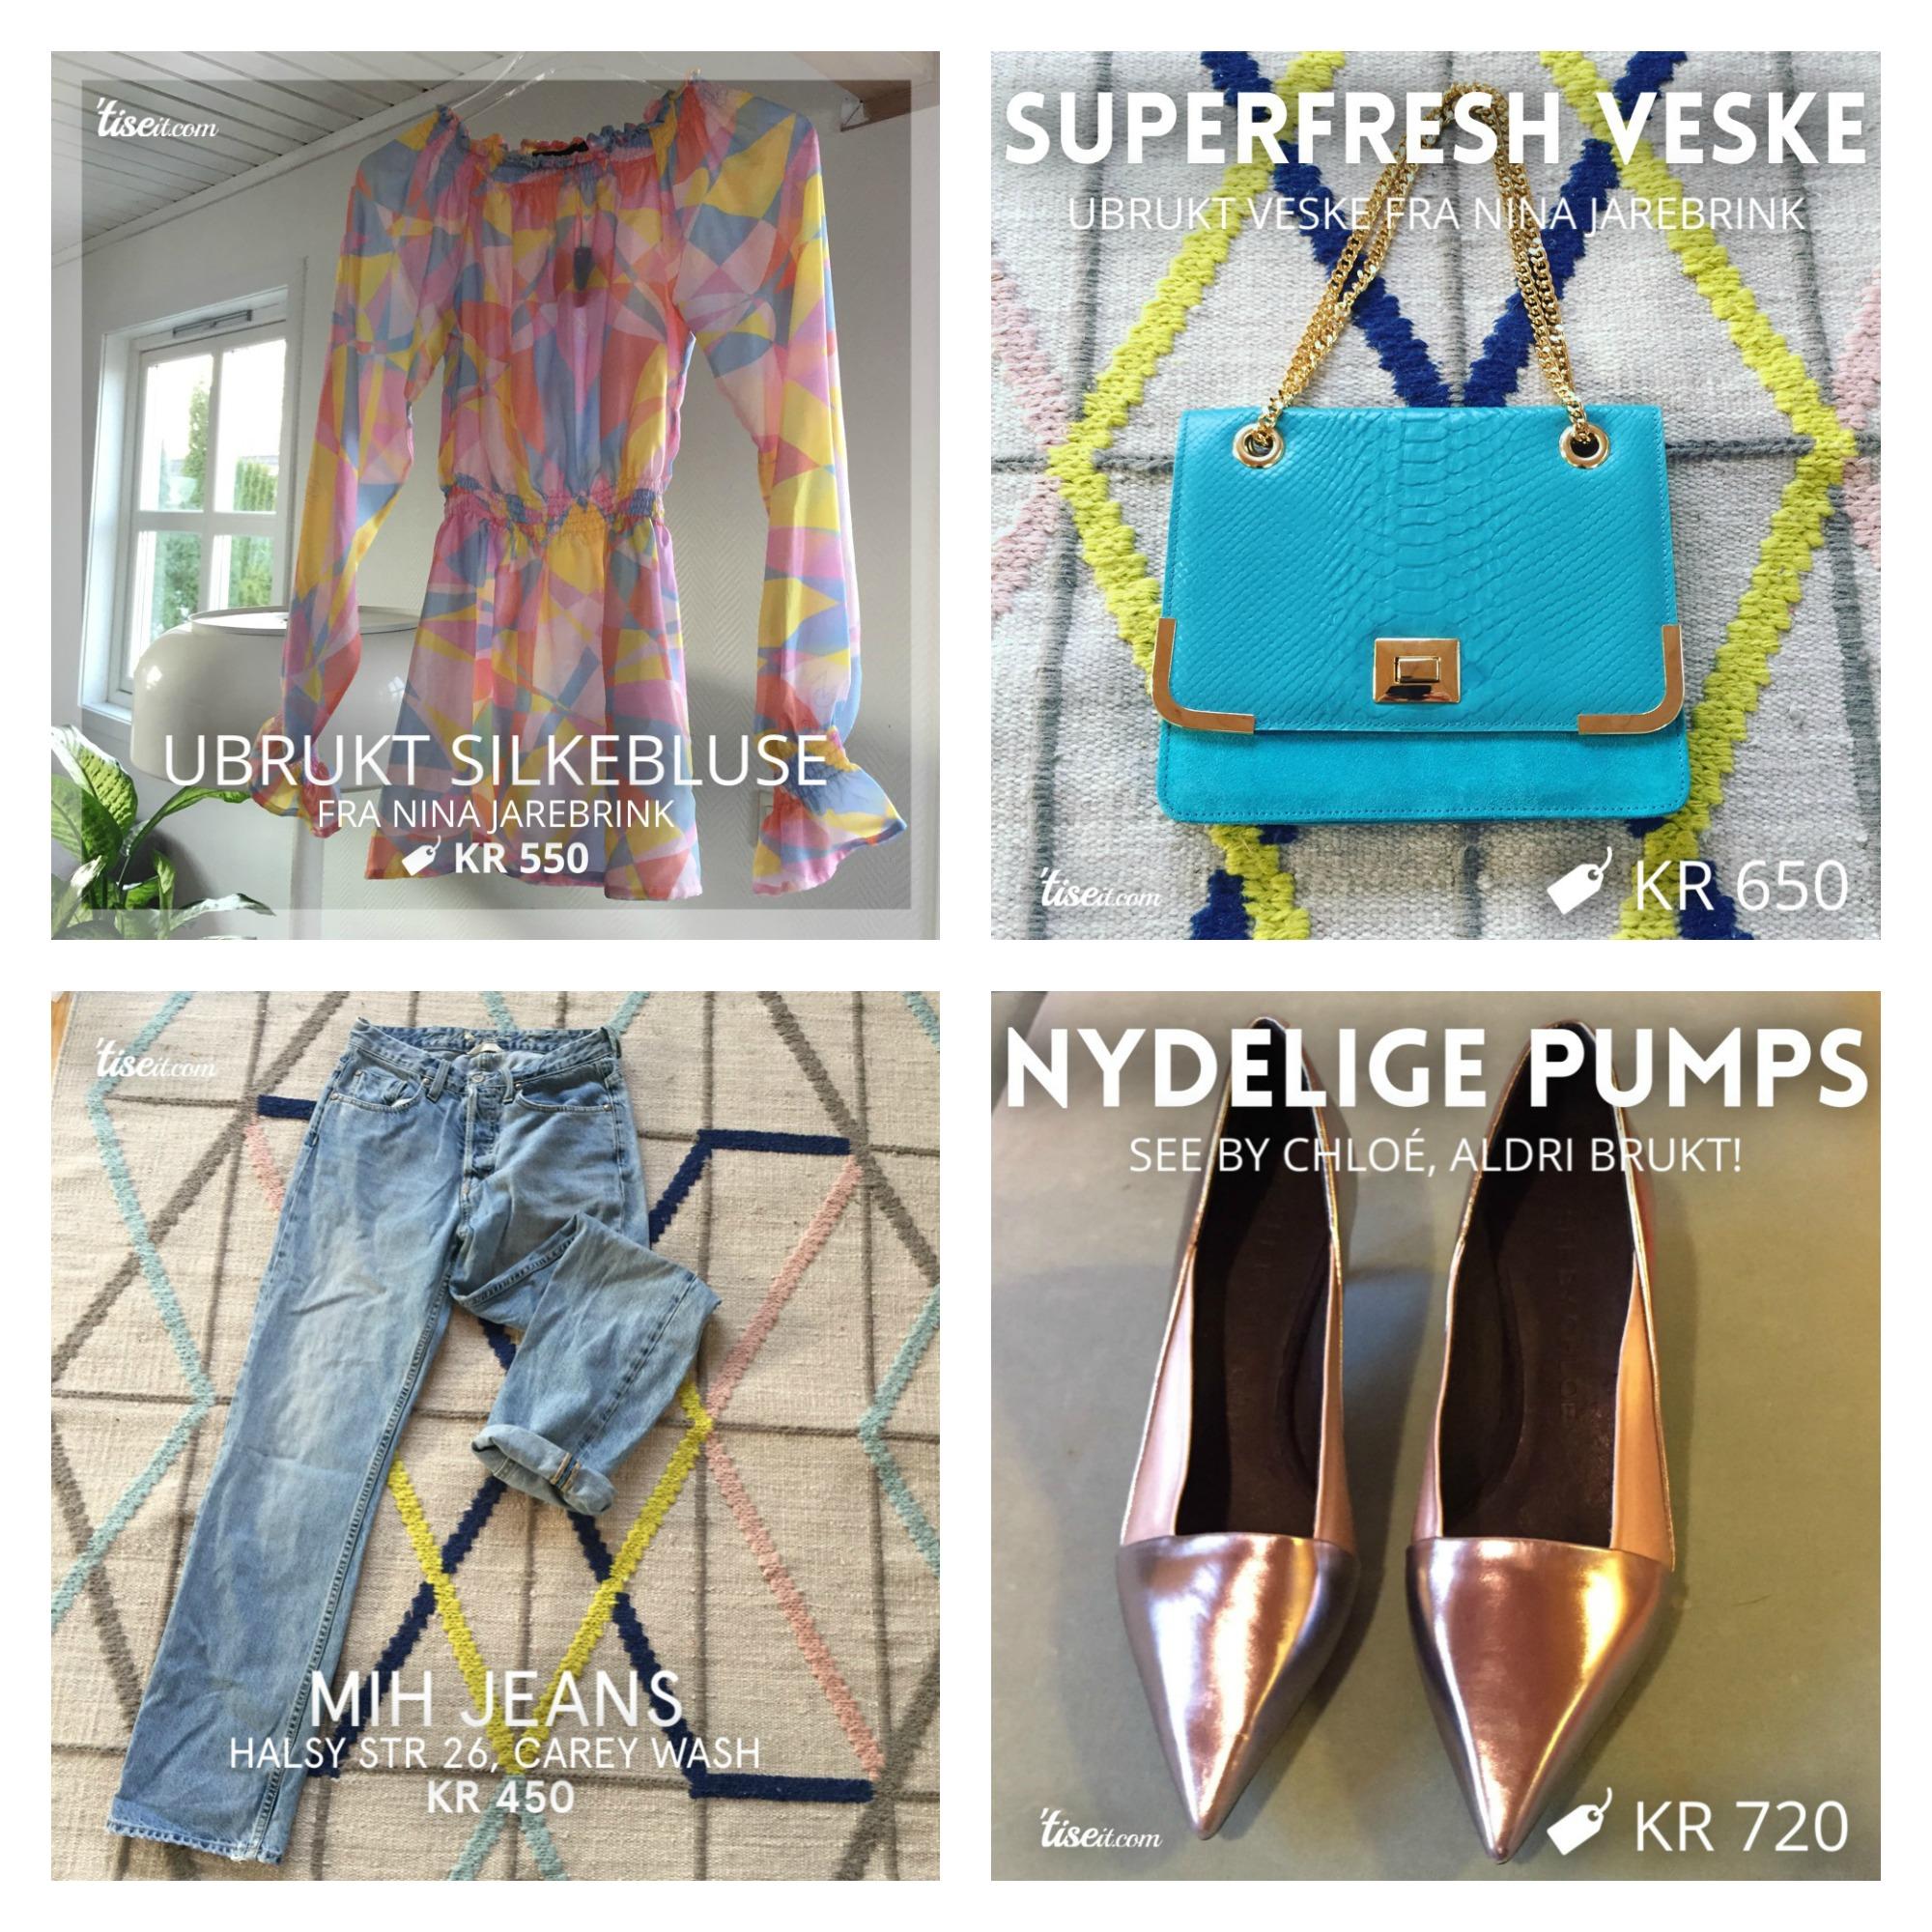 tise-collage-blouse-bag-jeans-pumps